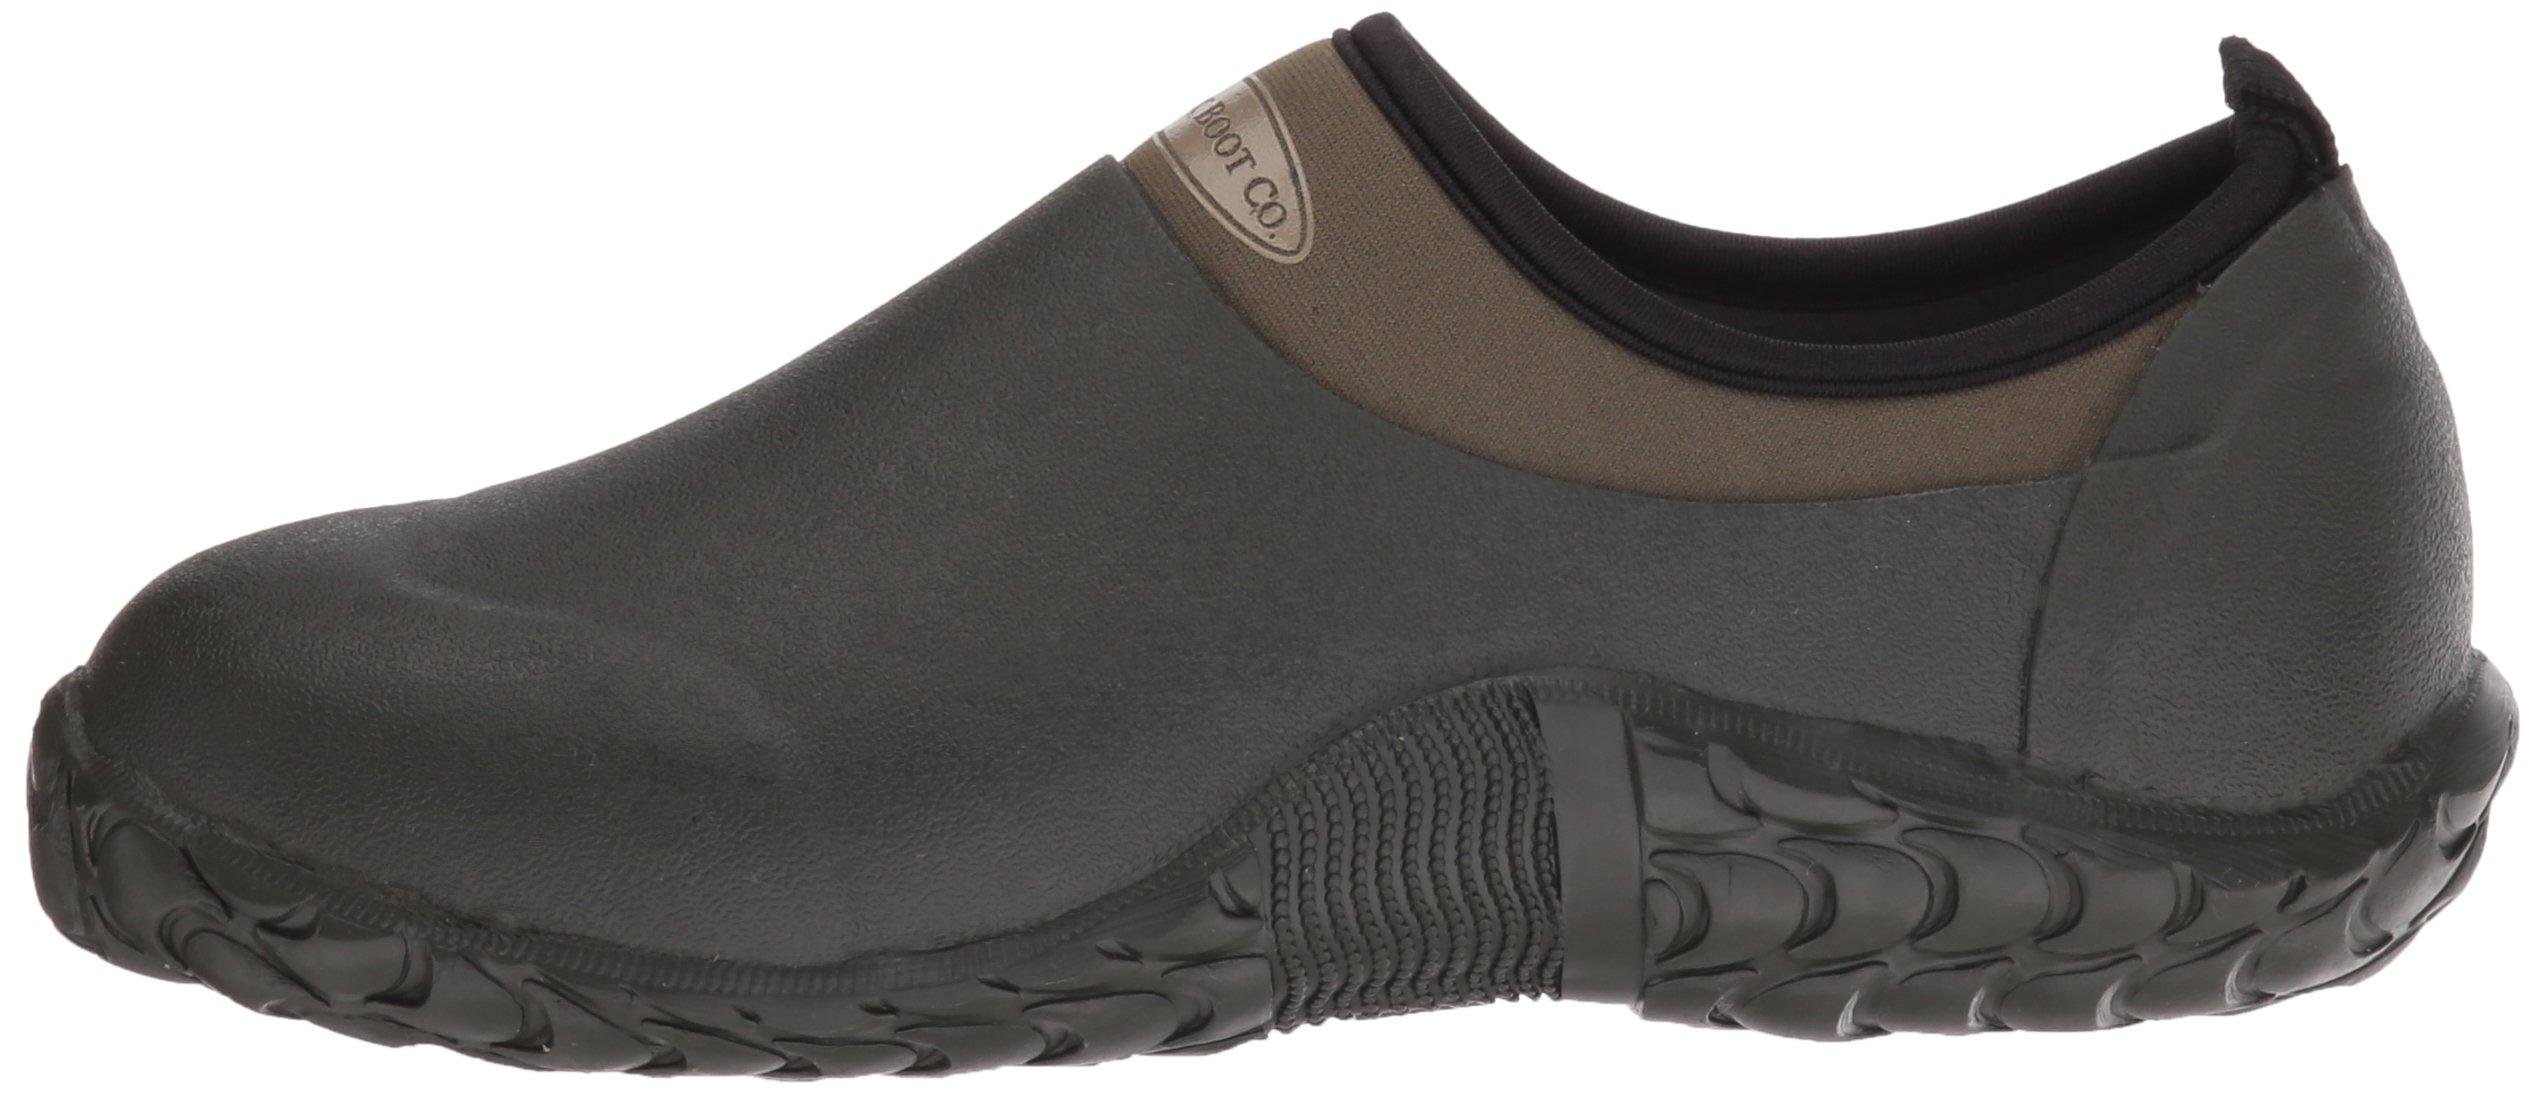 The Original MuckBoots Unisex Edgewater Camp Shoe,Moss ,11 M US Mens/12 M US Womens by Muck Boot (Image #5)